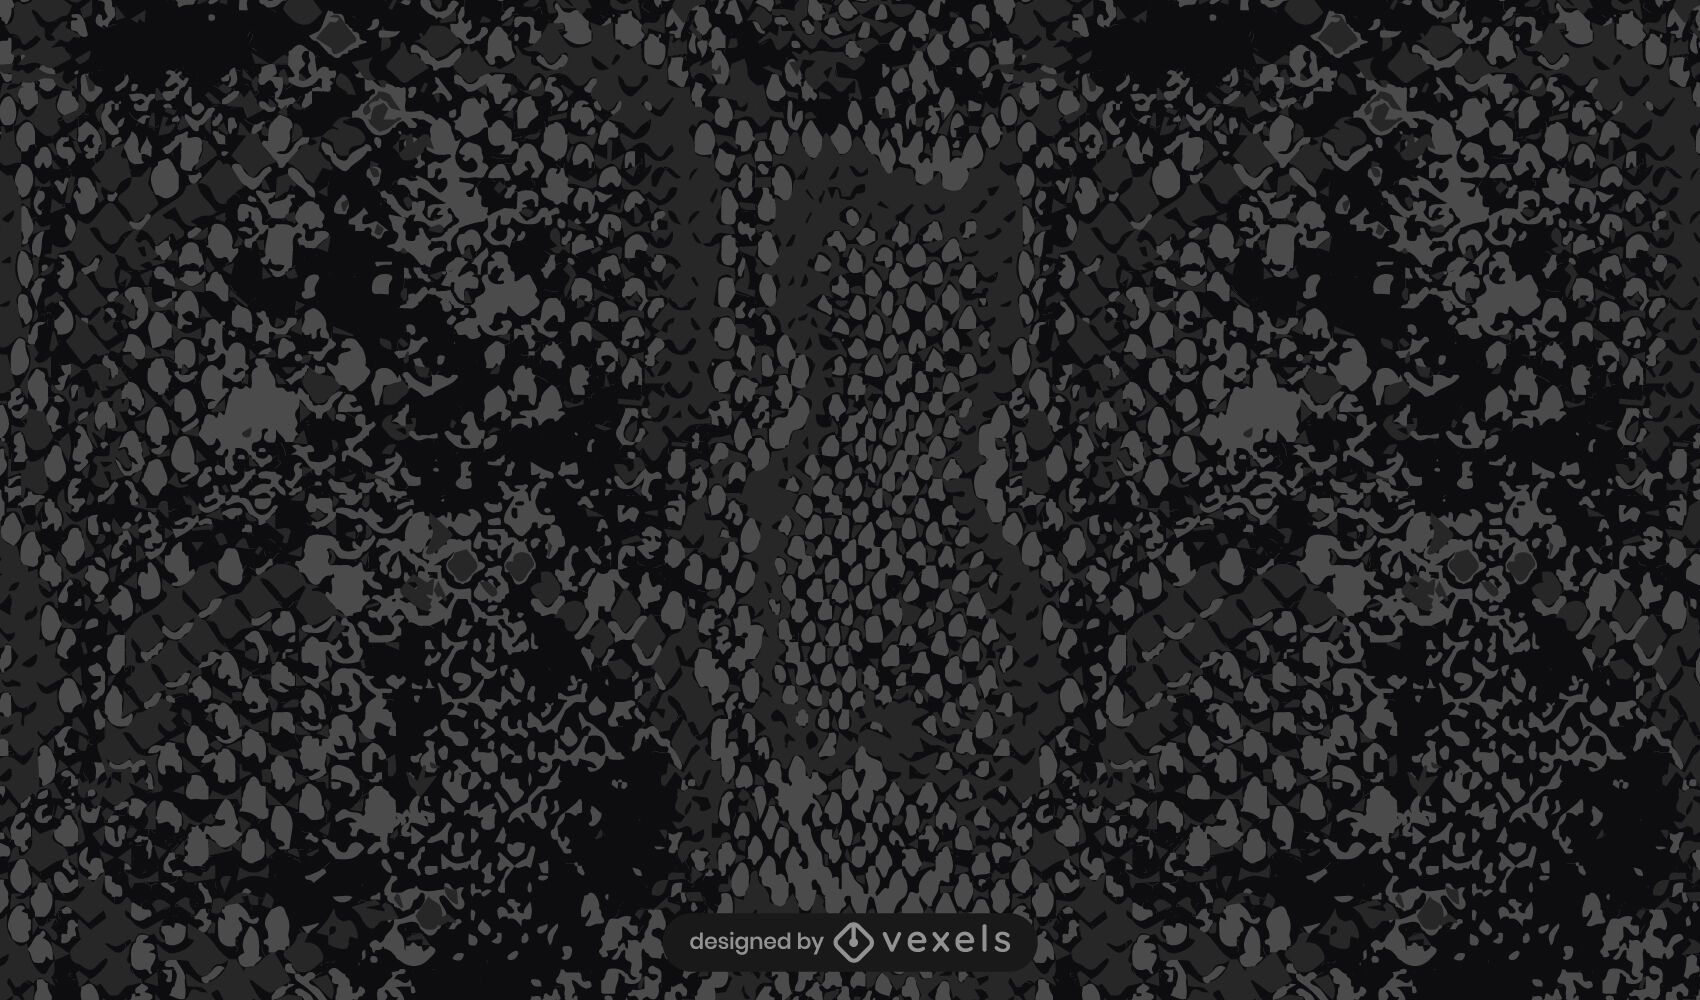 Black snake skin pattern design